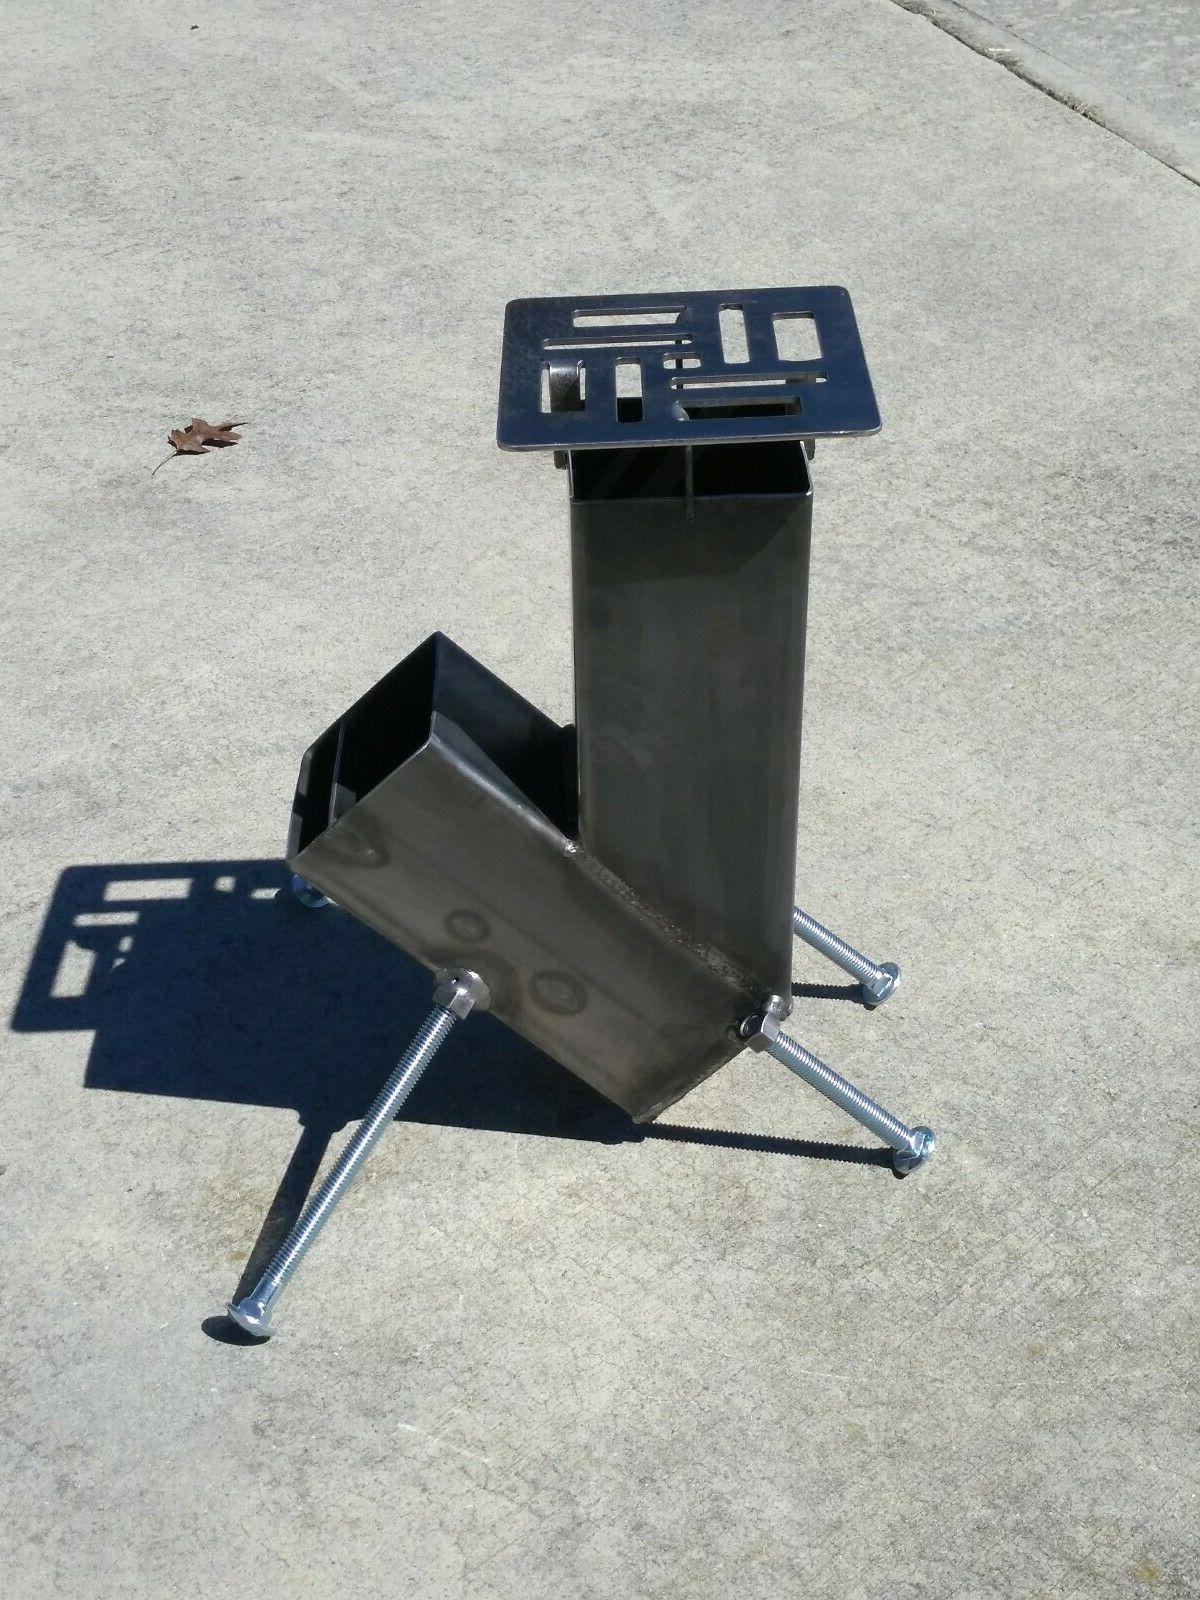 rocket stove gravity feed design be ready